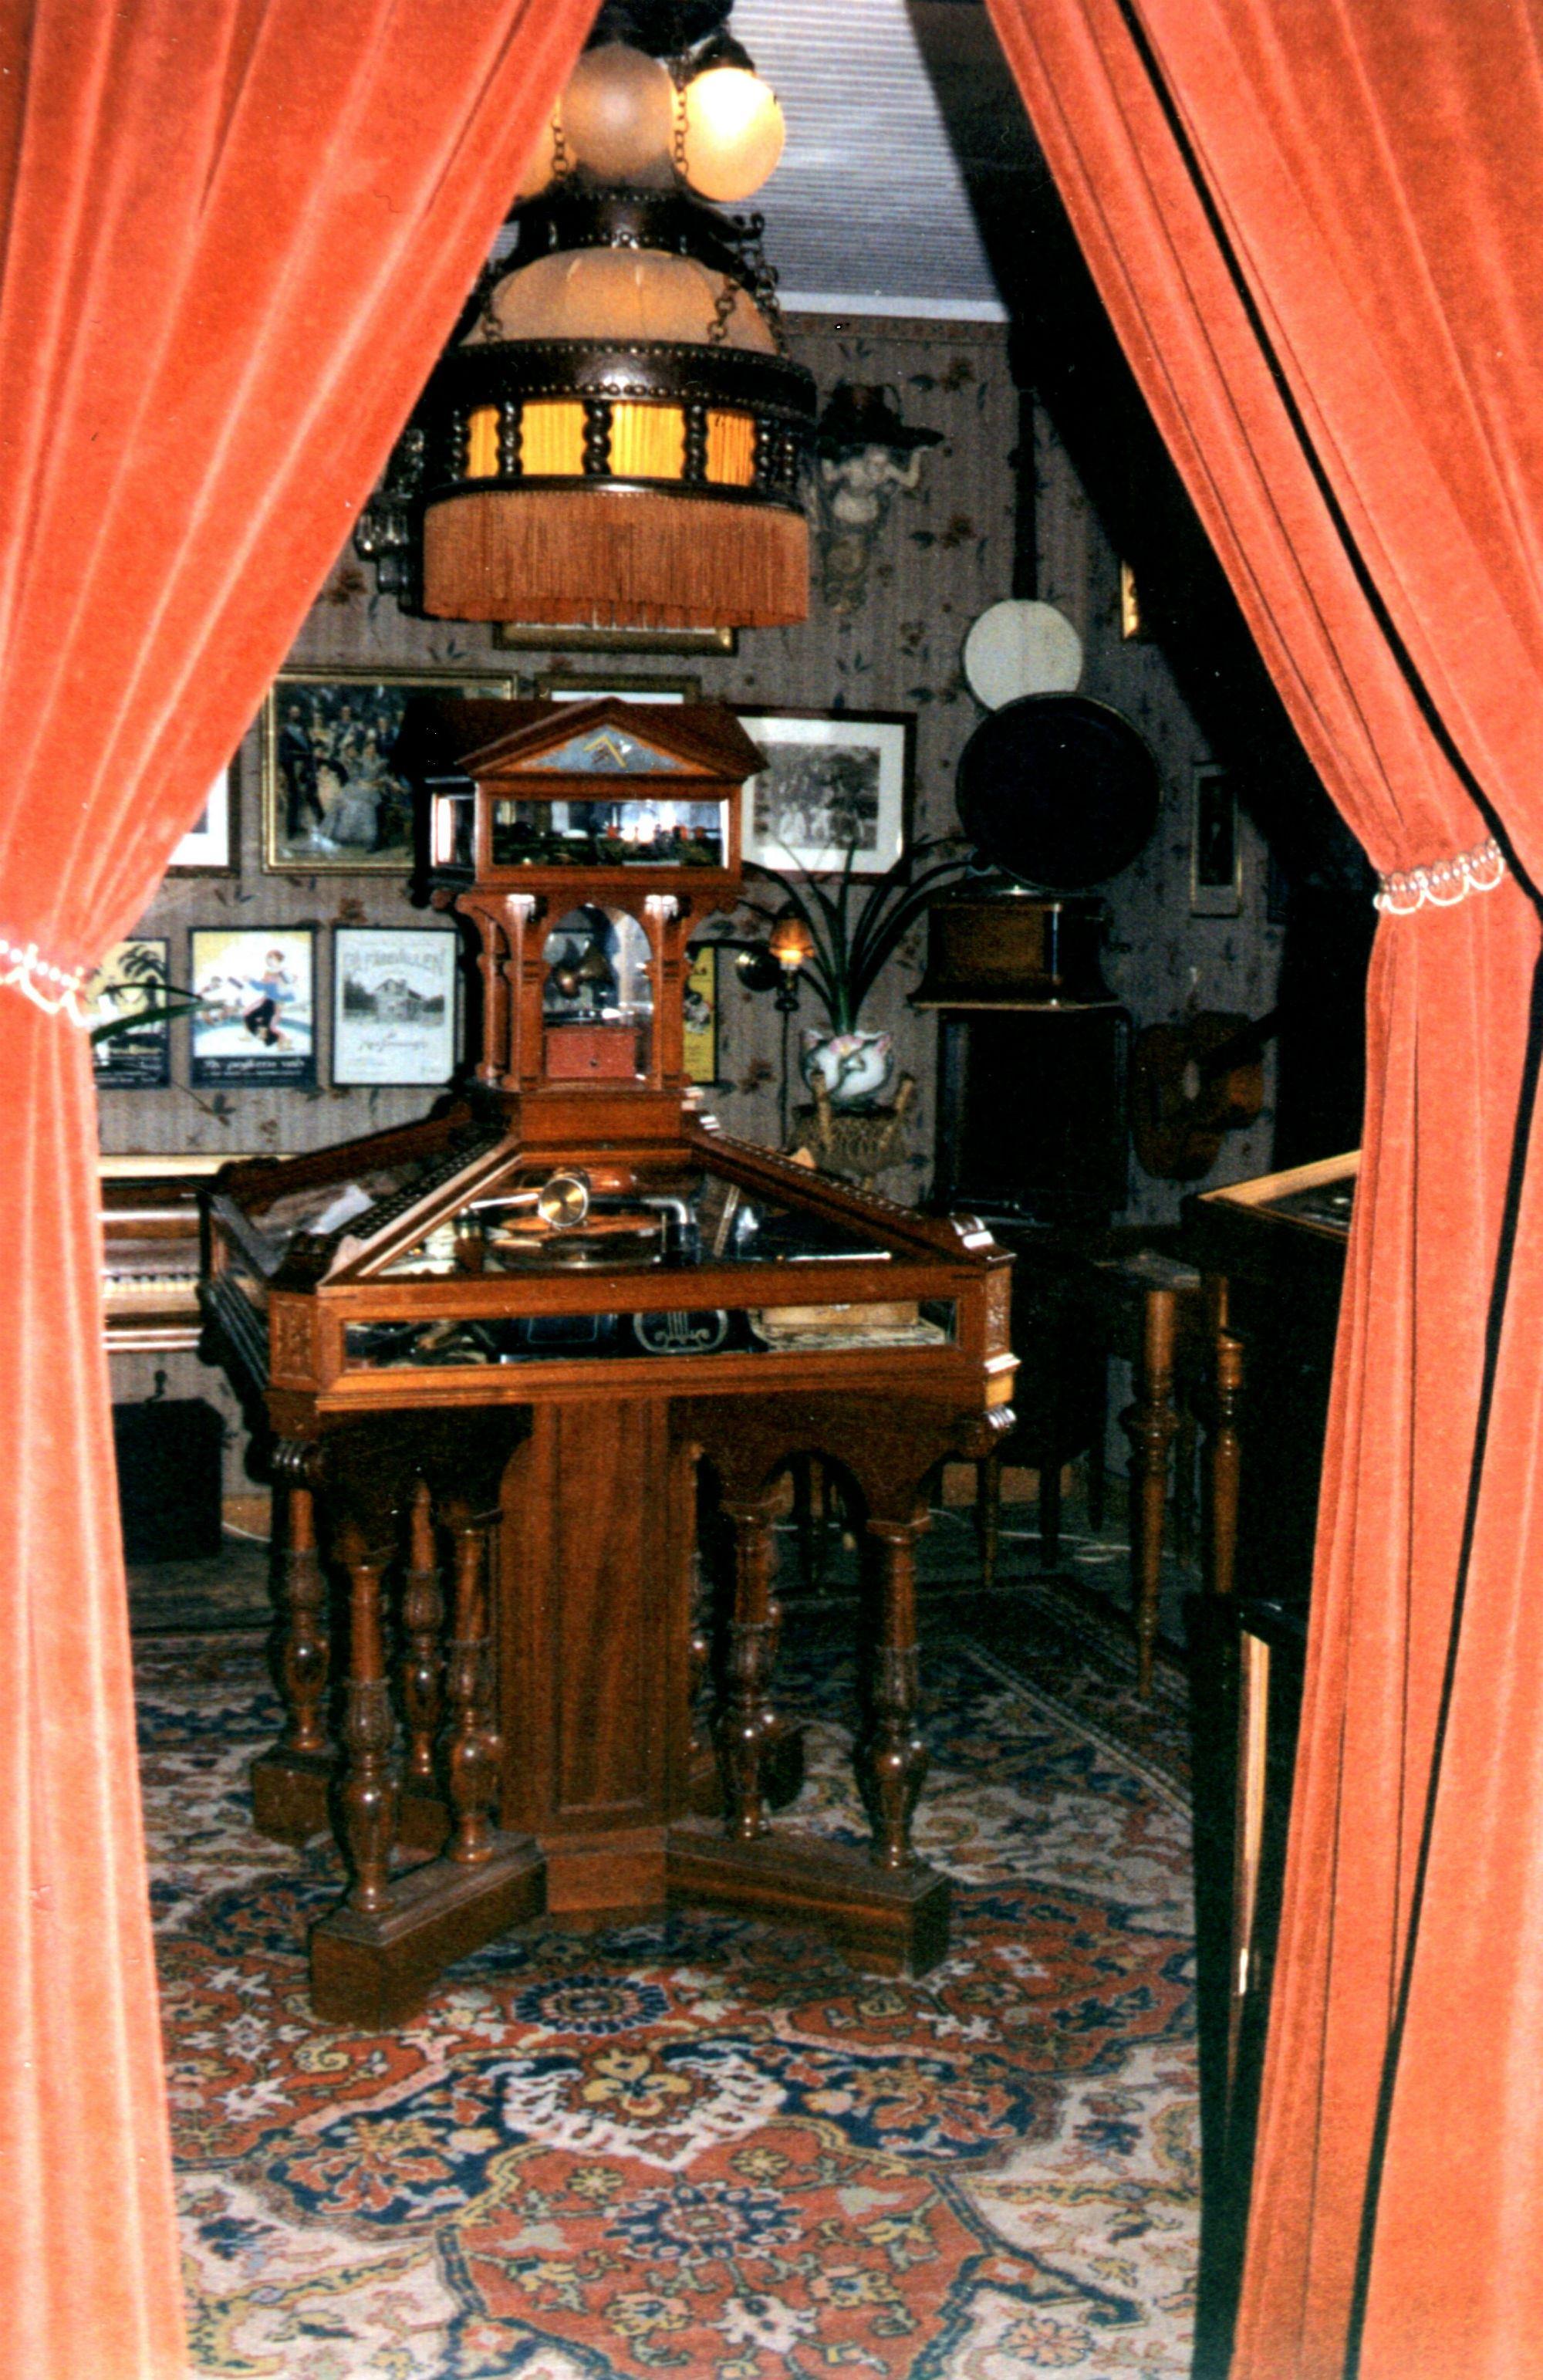 Kvarnbackens Teknik & Prylmuseum